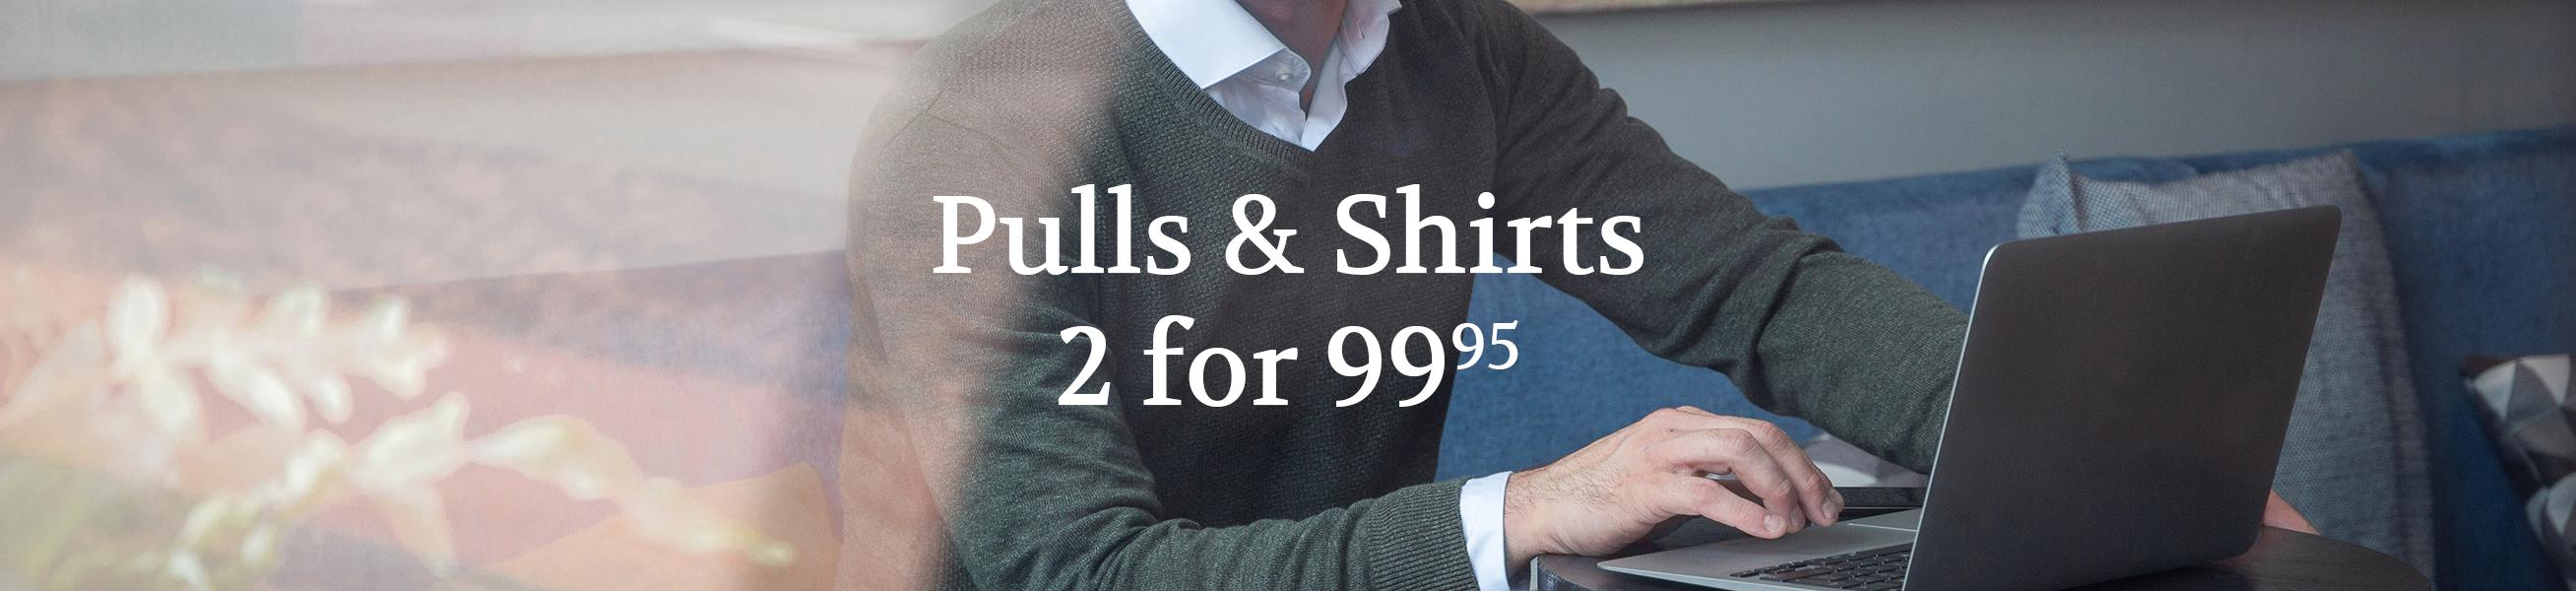 Pulls & Shirts